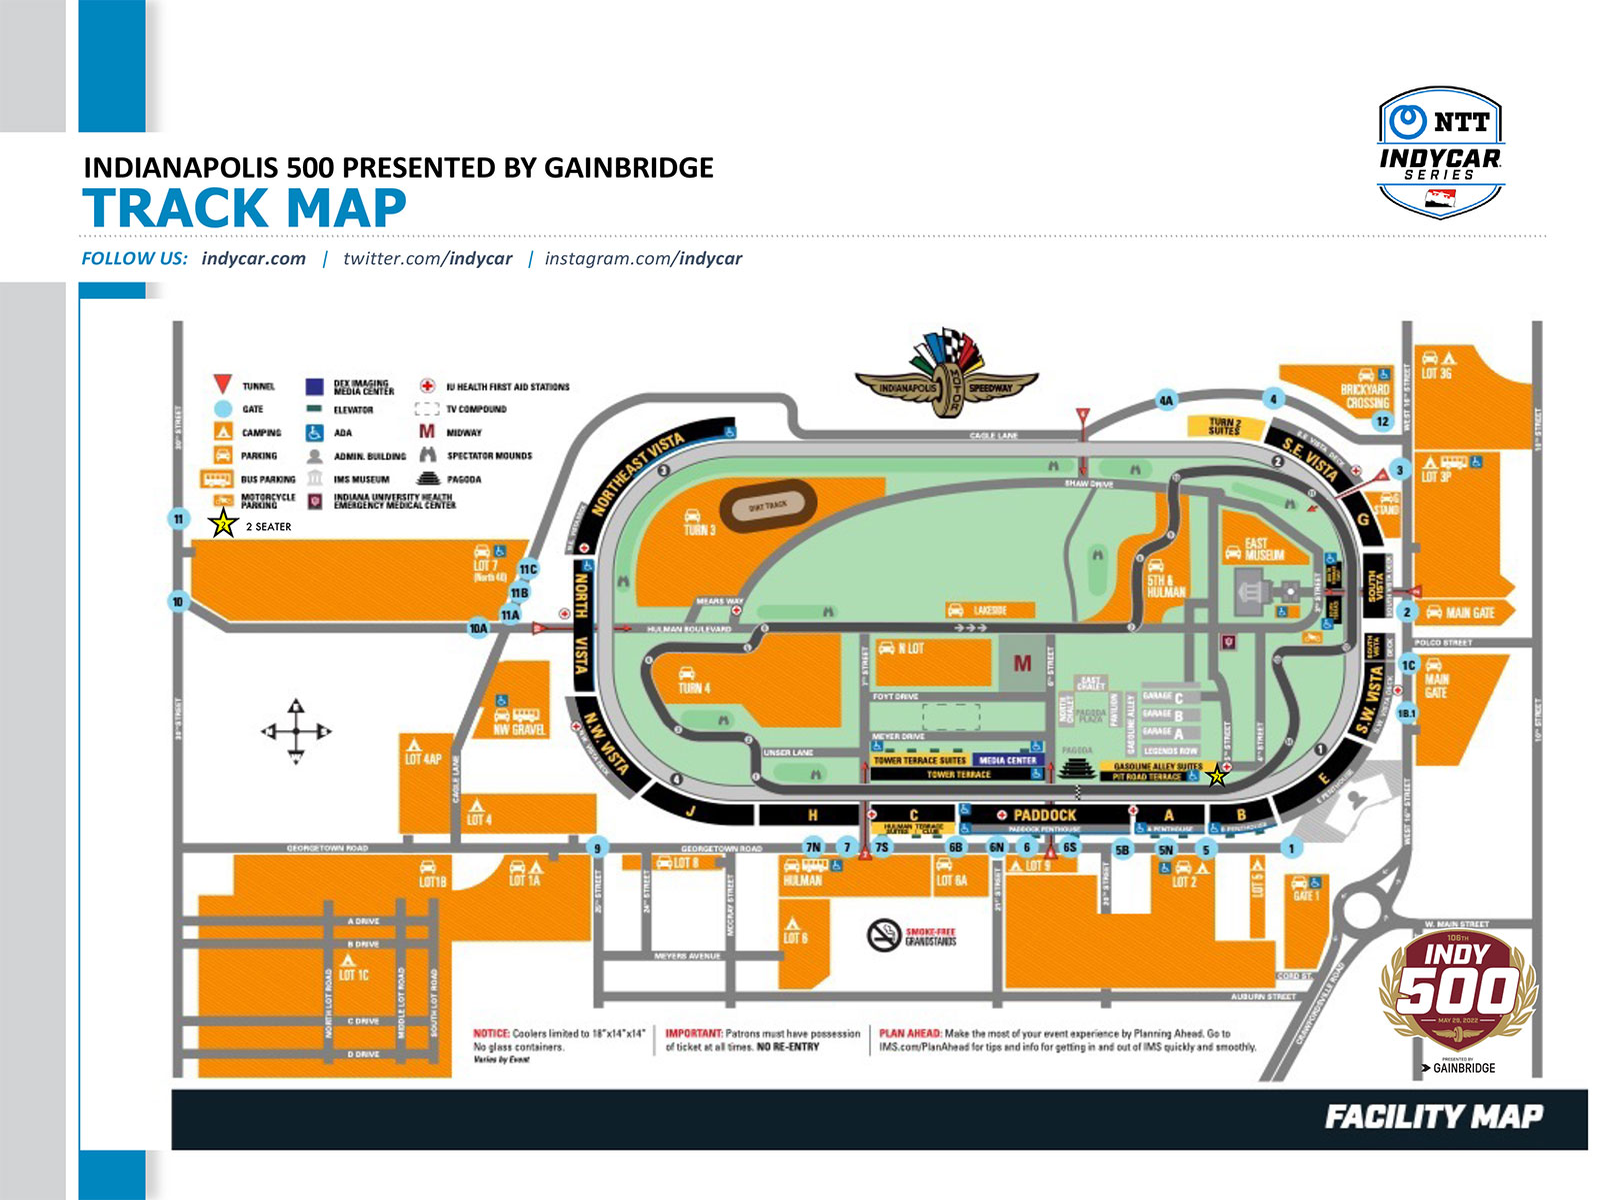 Indycar | Indianapolis 500 2019 | Anteprima 1